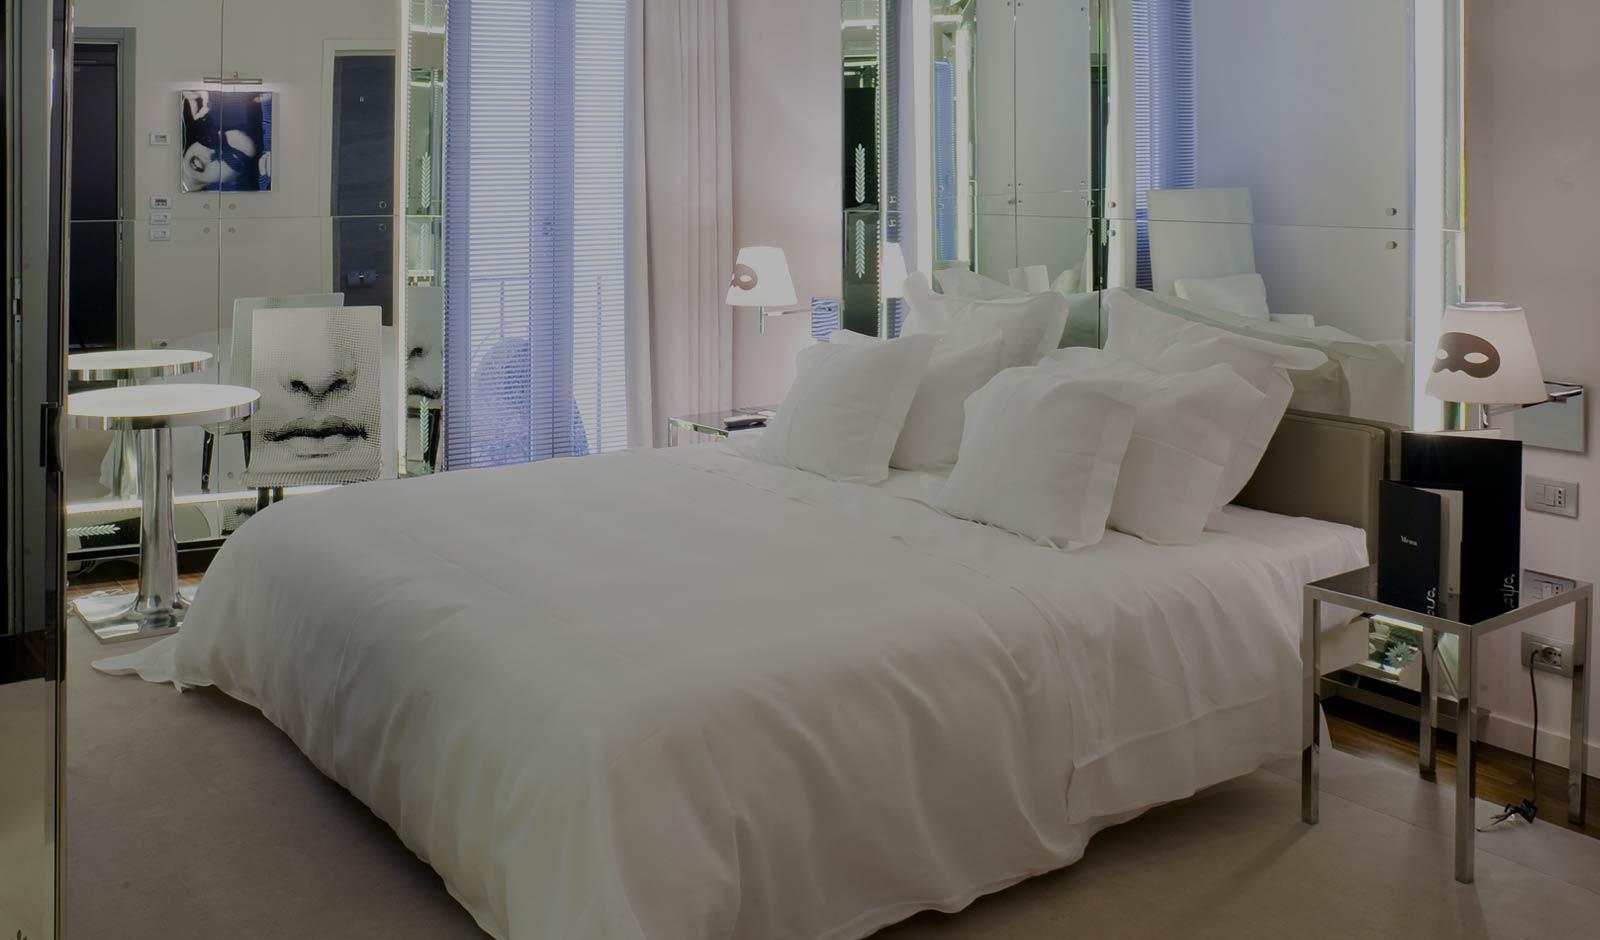 Best Hotels in Venice, Palazzina Grassi, Antiques Diva Venice Tours